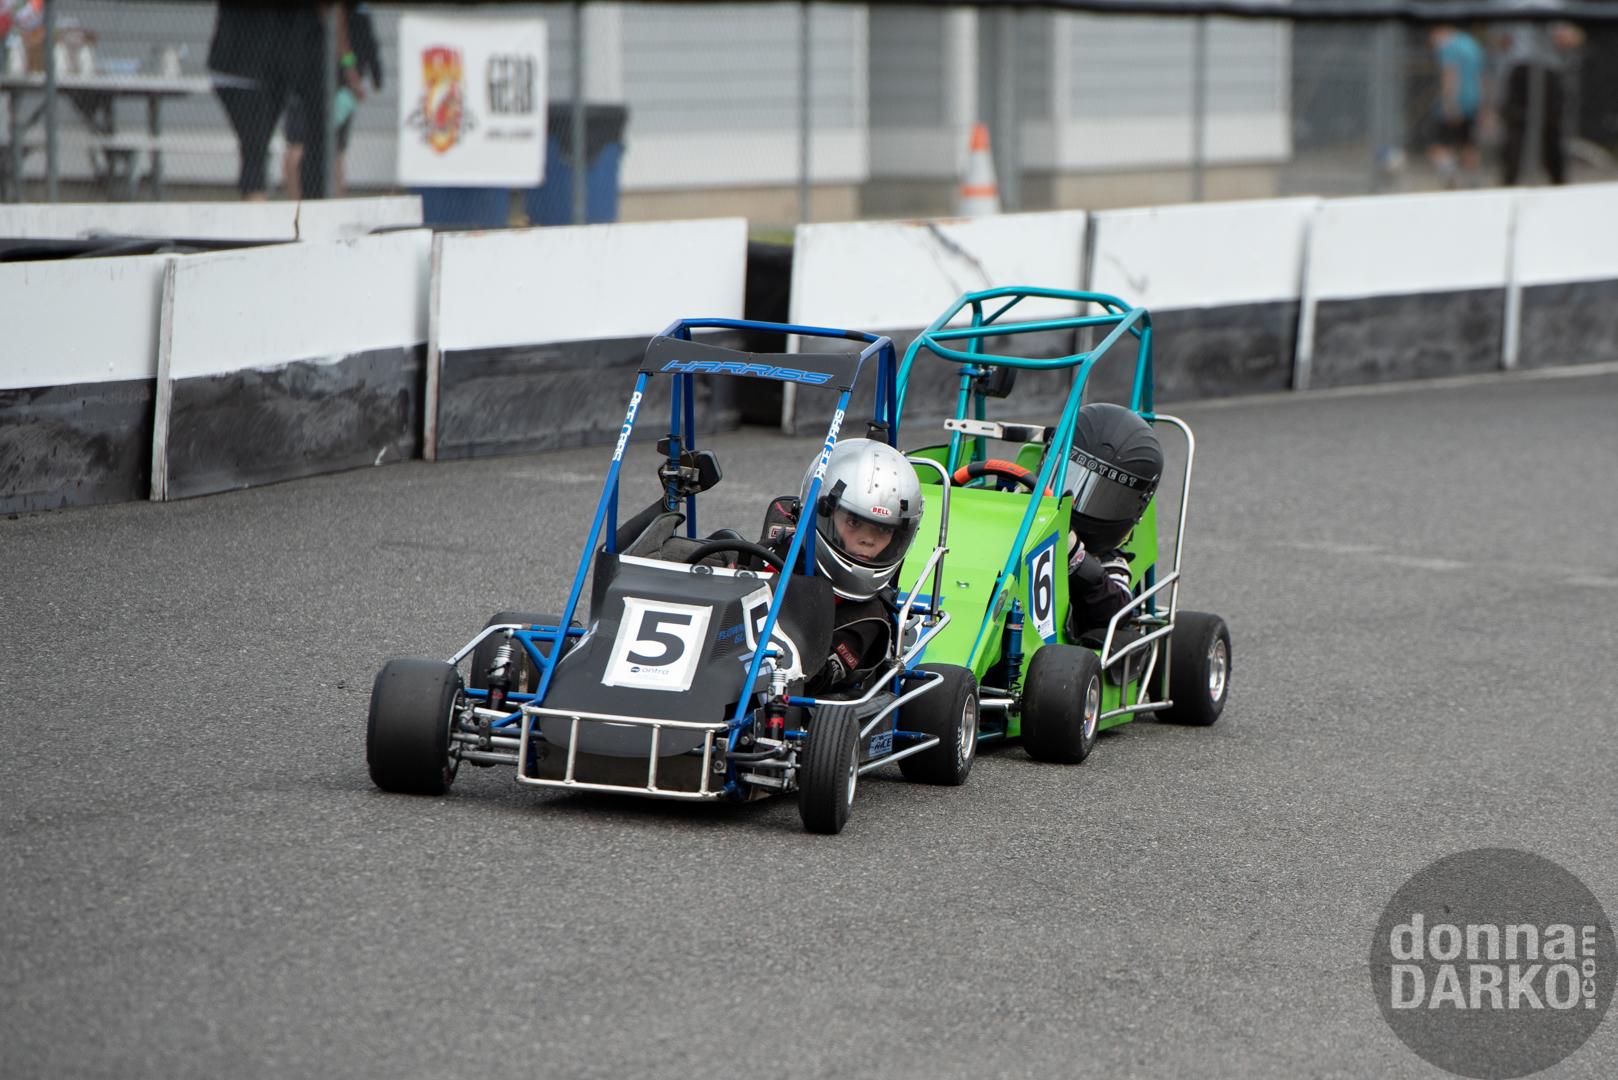 QWMA (Racing) 8-11-2019 DSC_7486.jpg